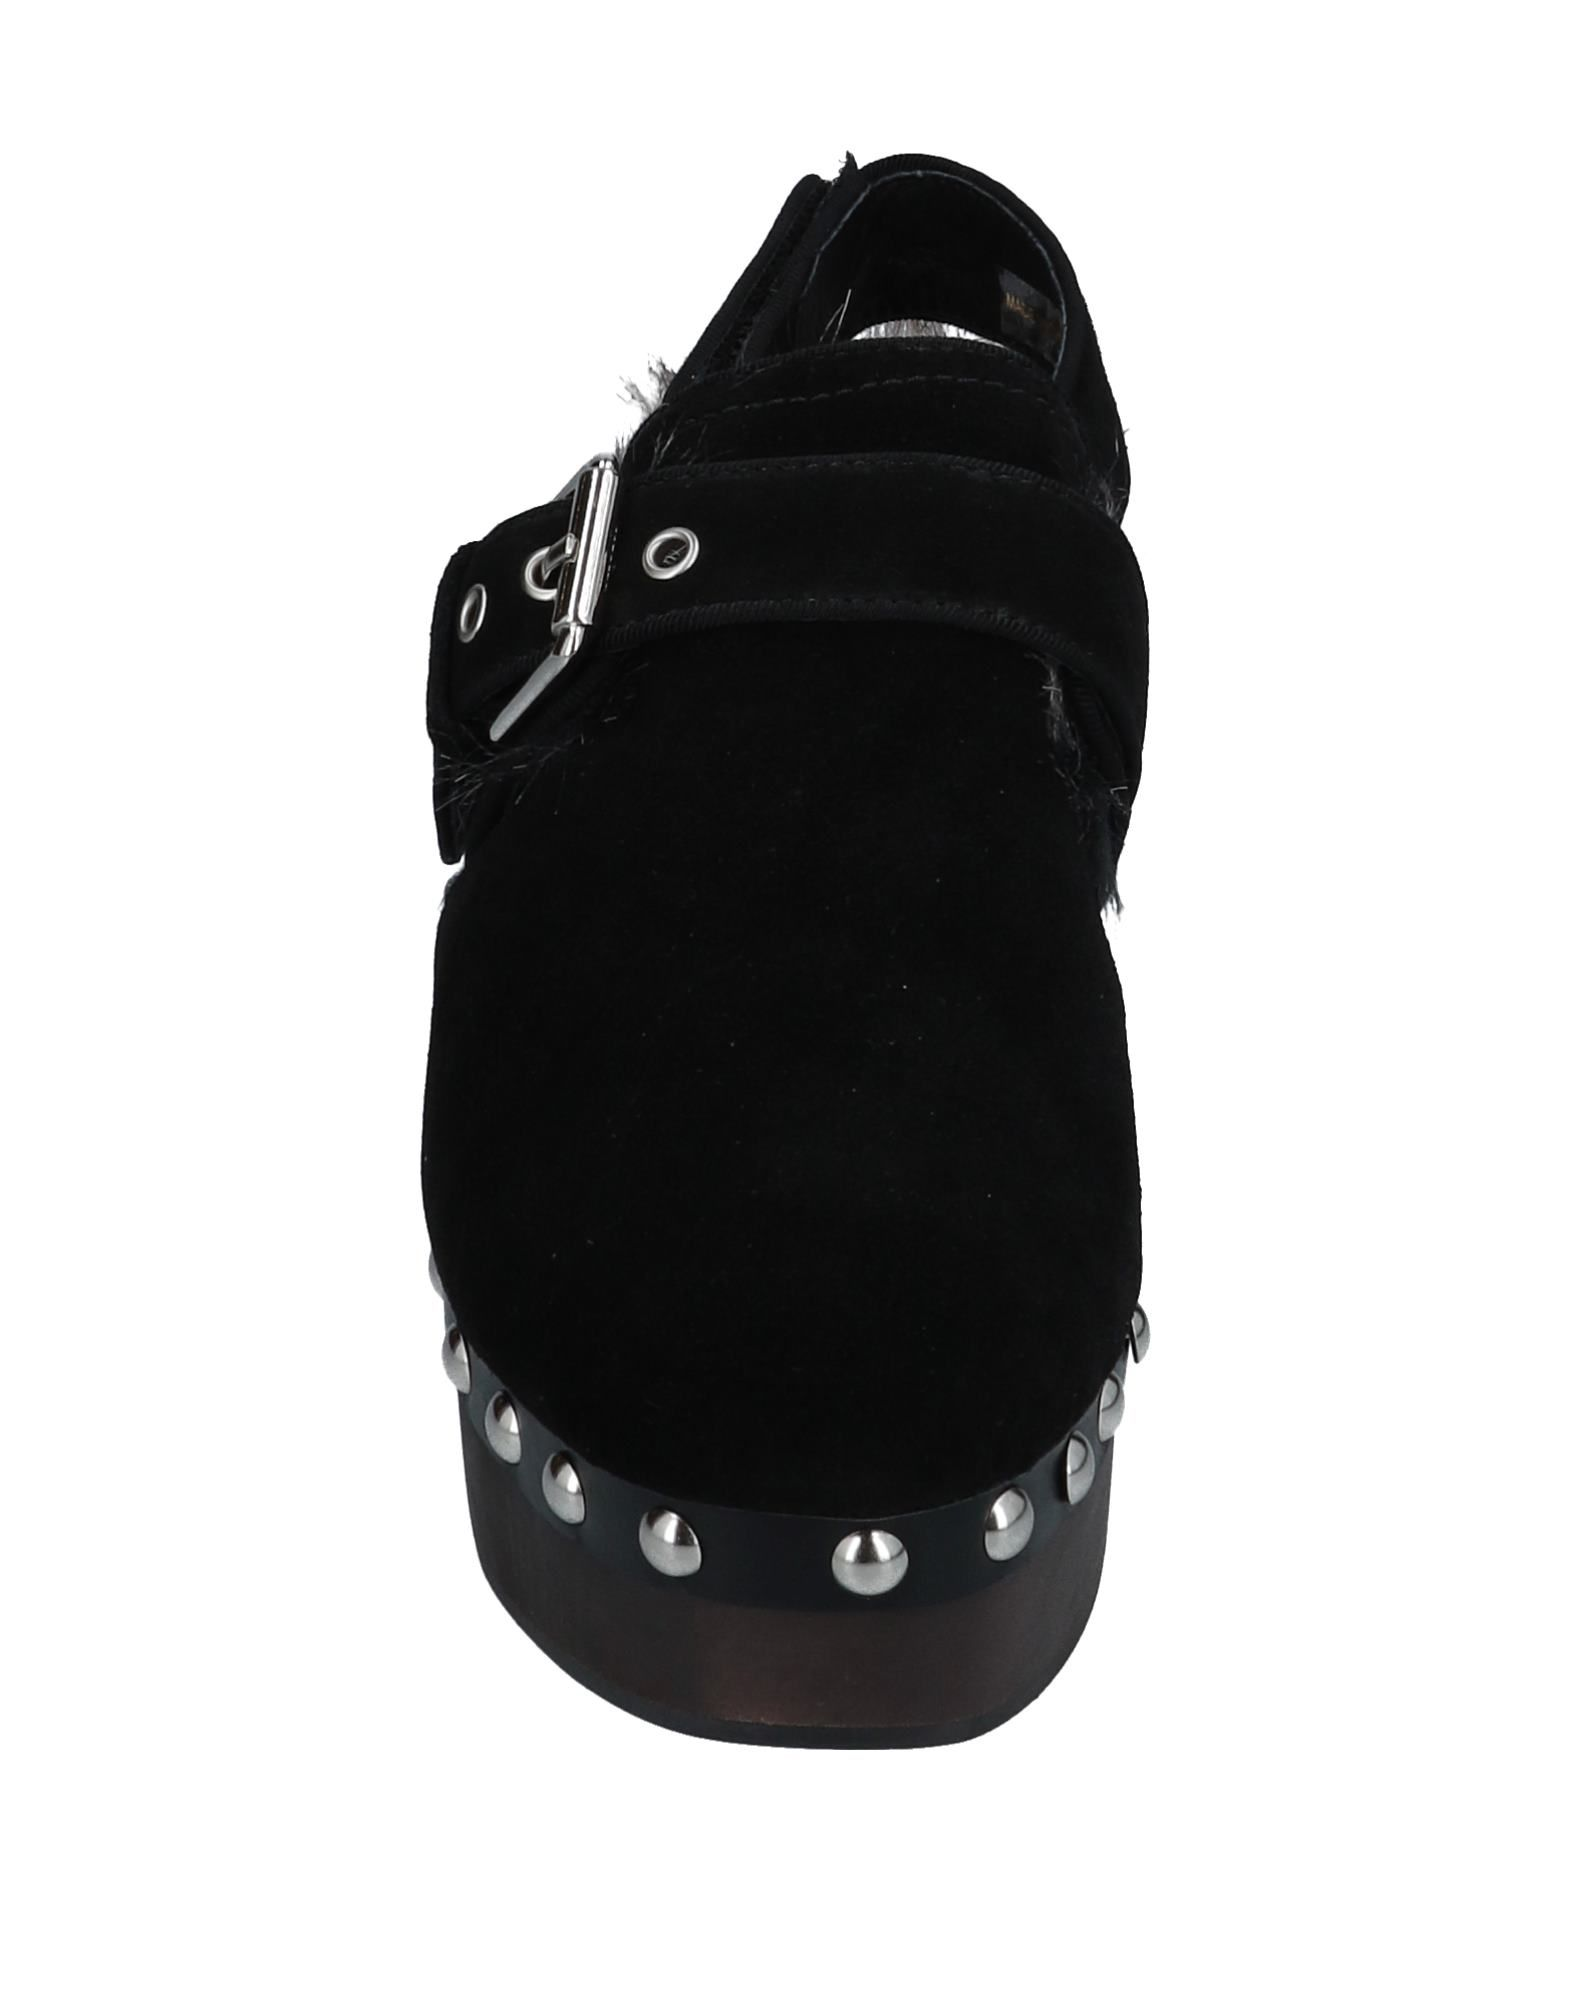 Bibi 11556089SE Lou Pantoletten Damen  11556089SE Bibi Gute Qualität beliebte Schuhe 3cf8e8